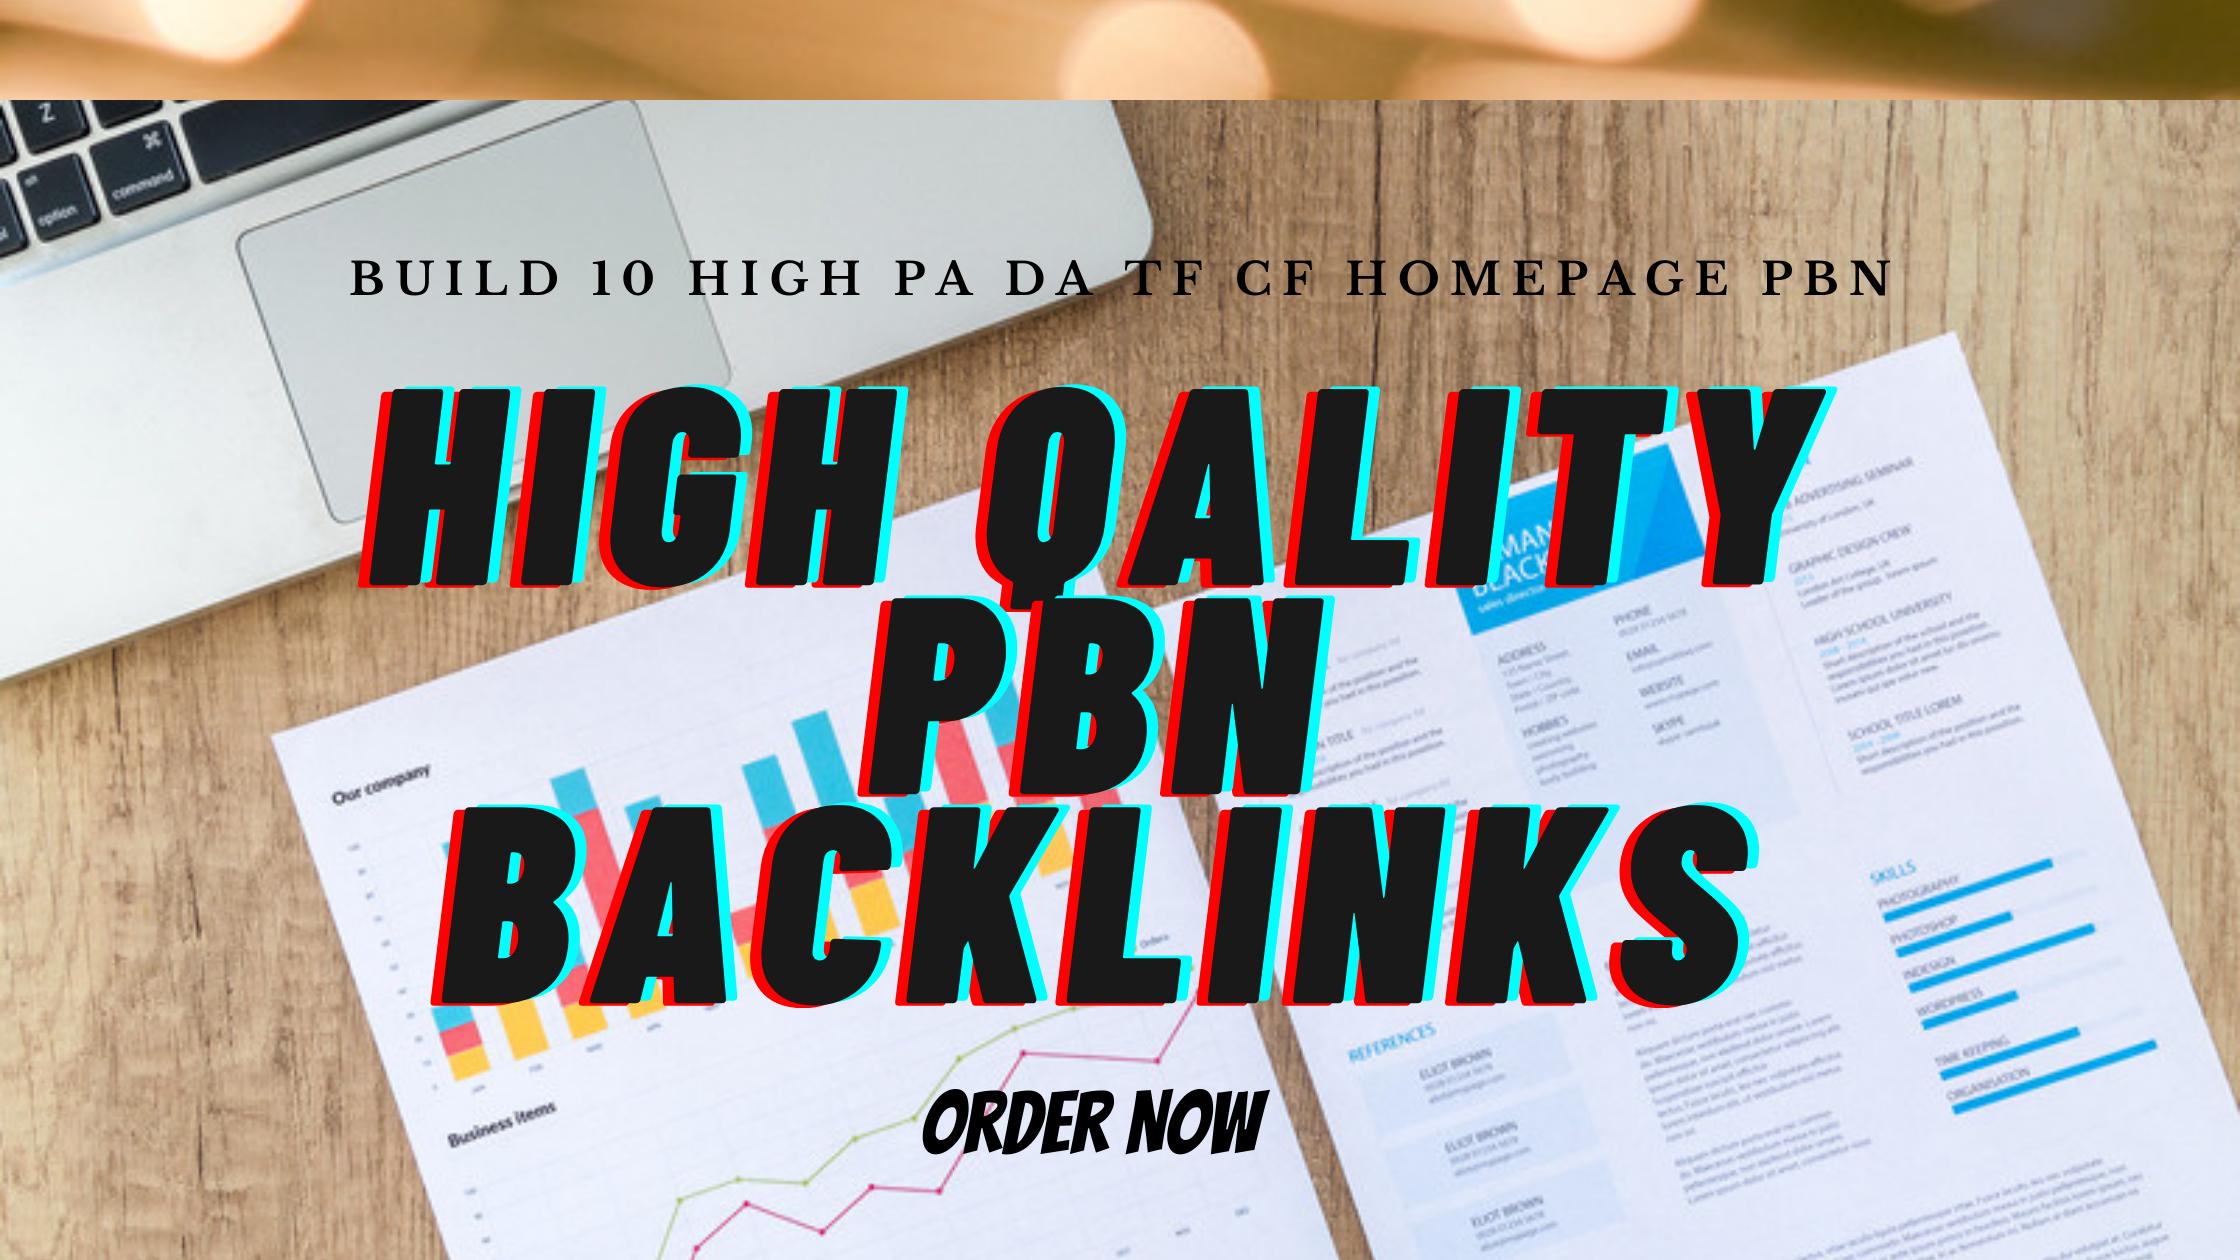 I Will do High DA DR PA homepage PBN Backlinks - Permanent Do follow links